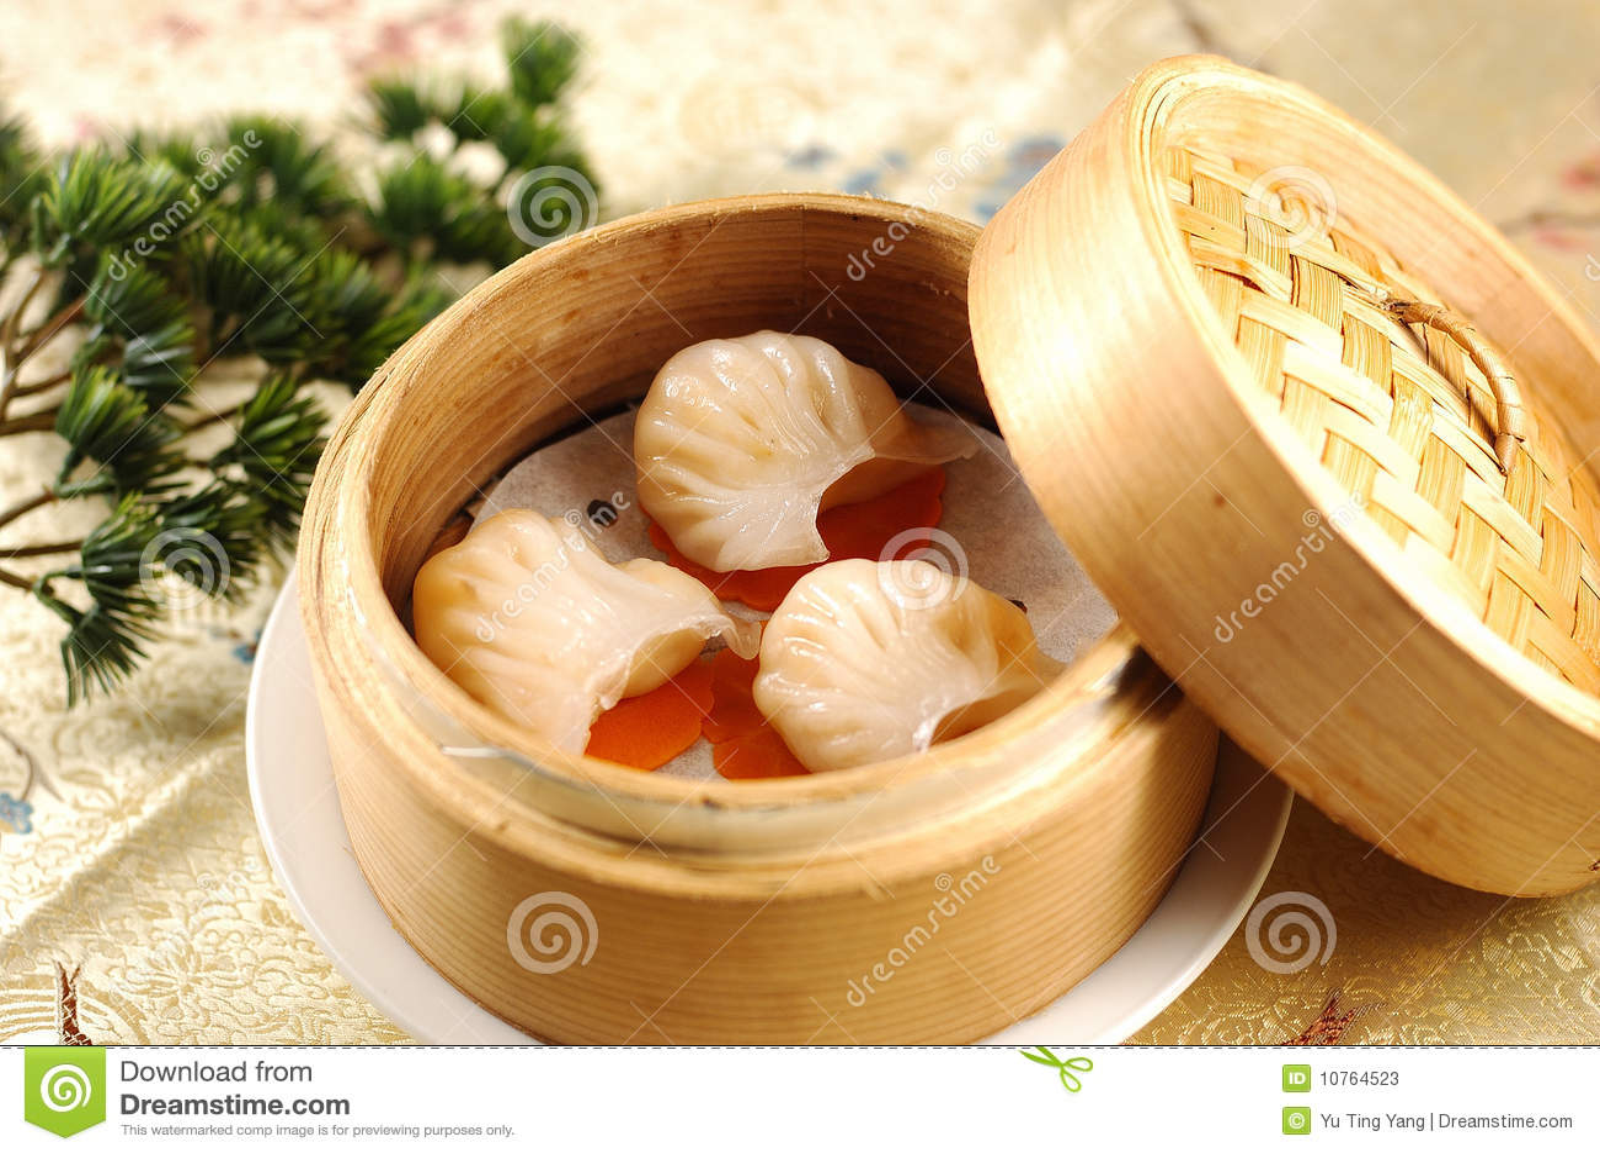 hong kong style dim sum prawn dumplings stock photos image 10764523. Black Bedroom Furniture Sets. Home Design Ideas